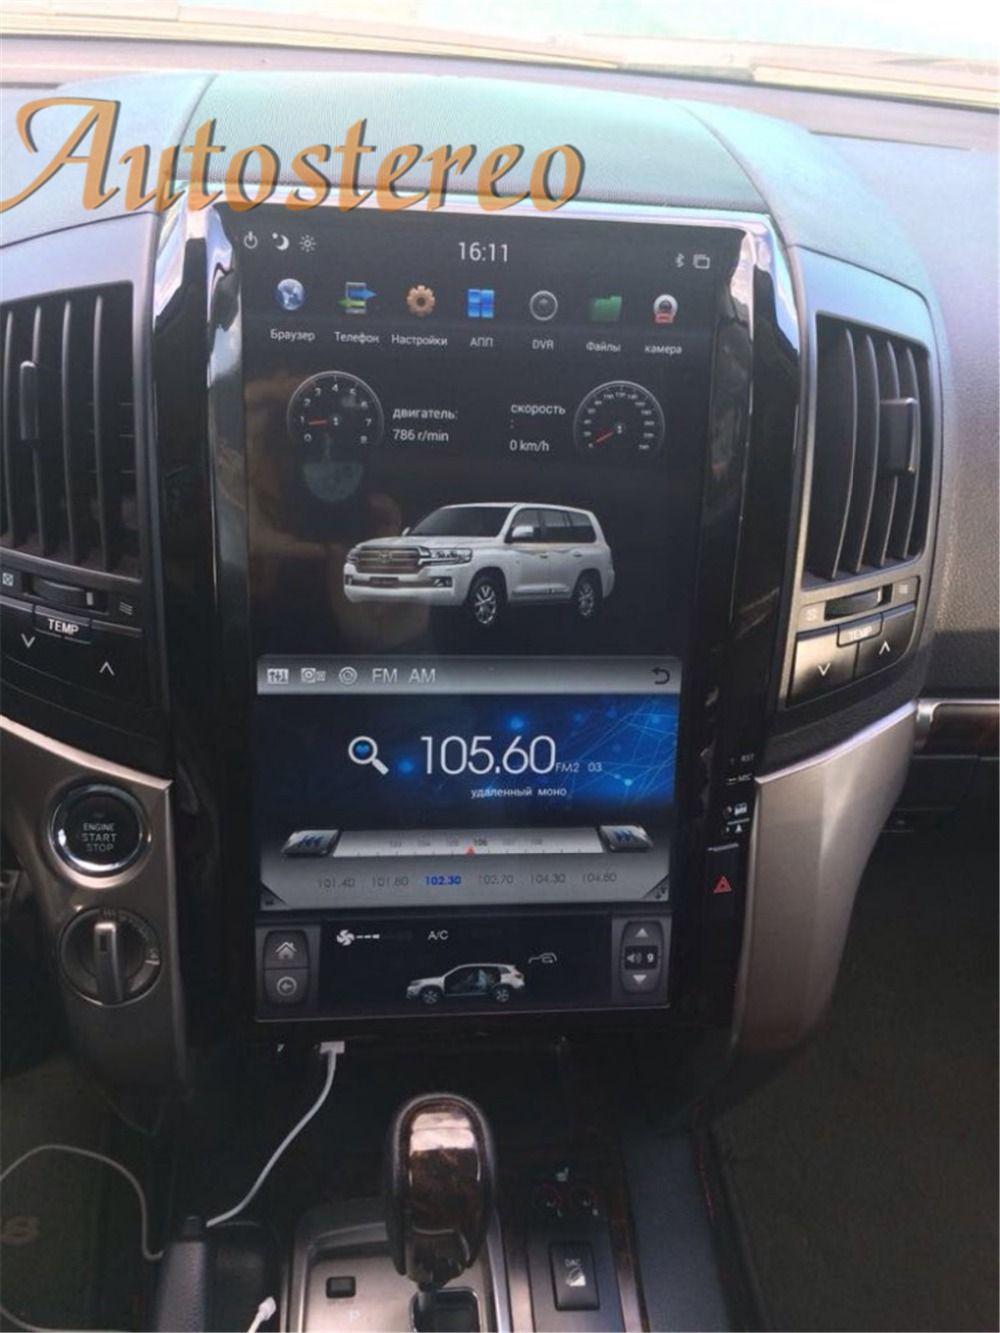 16 zoll Tesla stil Auto keine DVD-Player GPS Navigation auto Radio für TOYOTA LAND CRUISER LC200 2008-2015 PLUS stereo multimedia